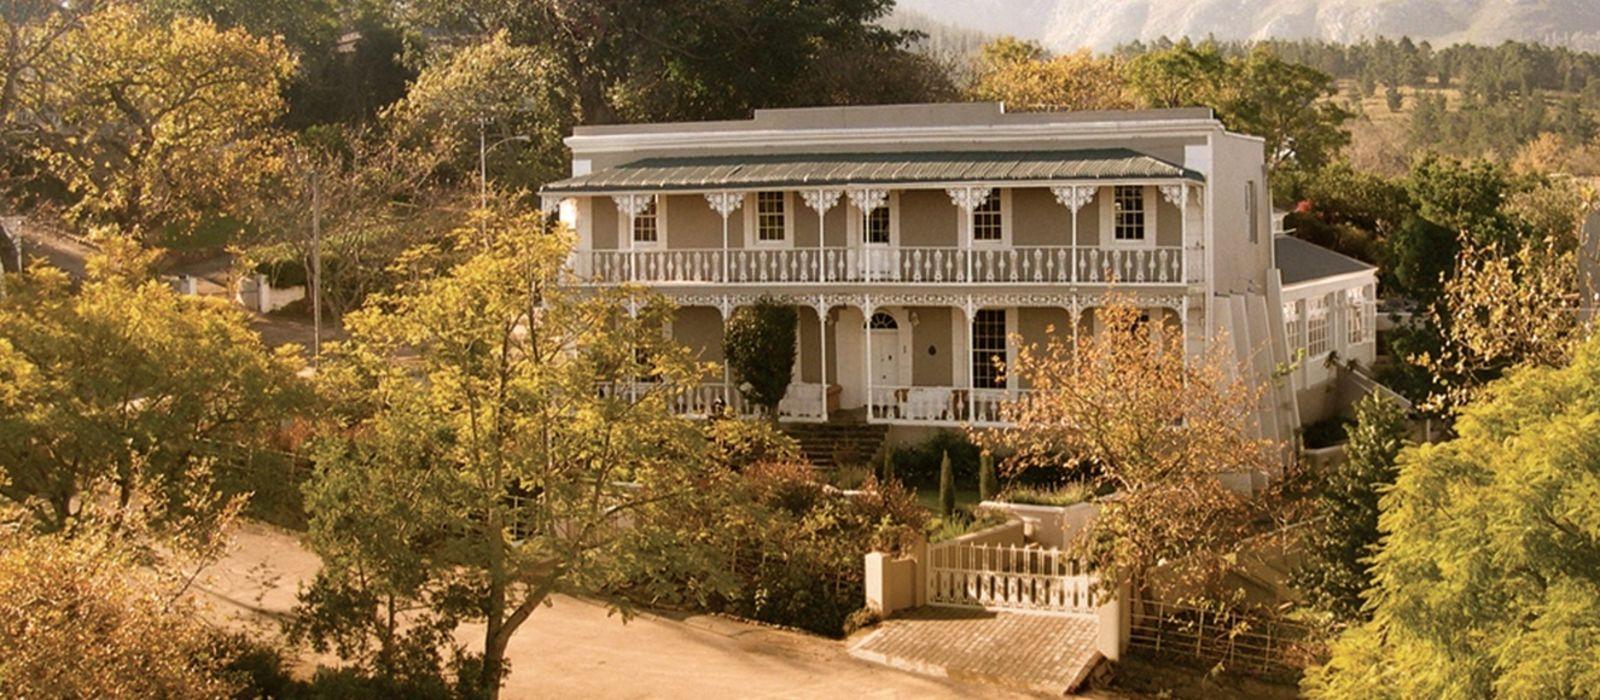 Hotel Schoone Oordt South Africa